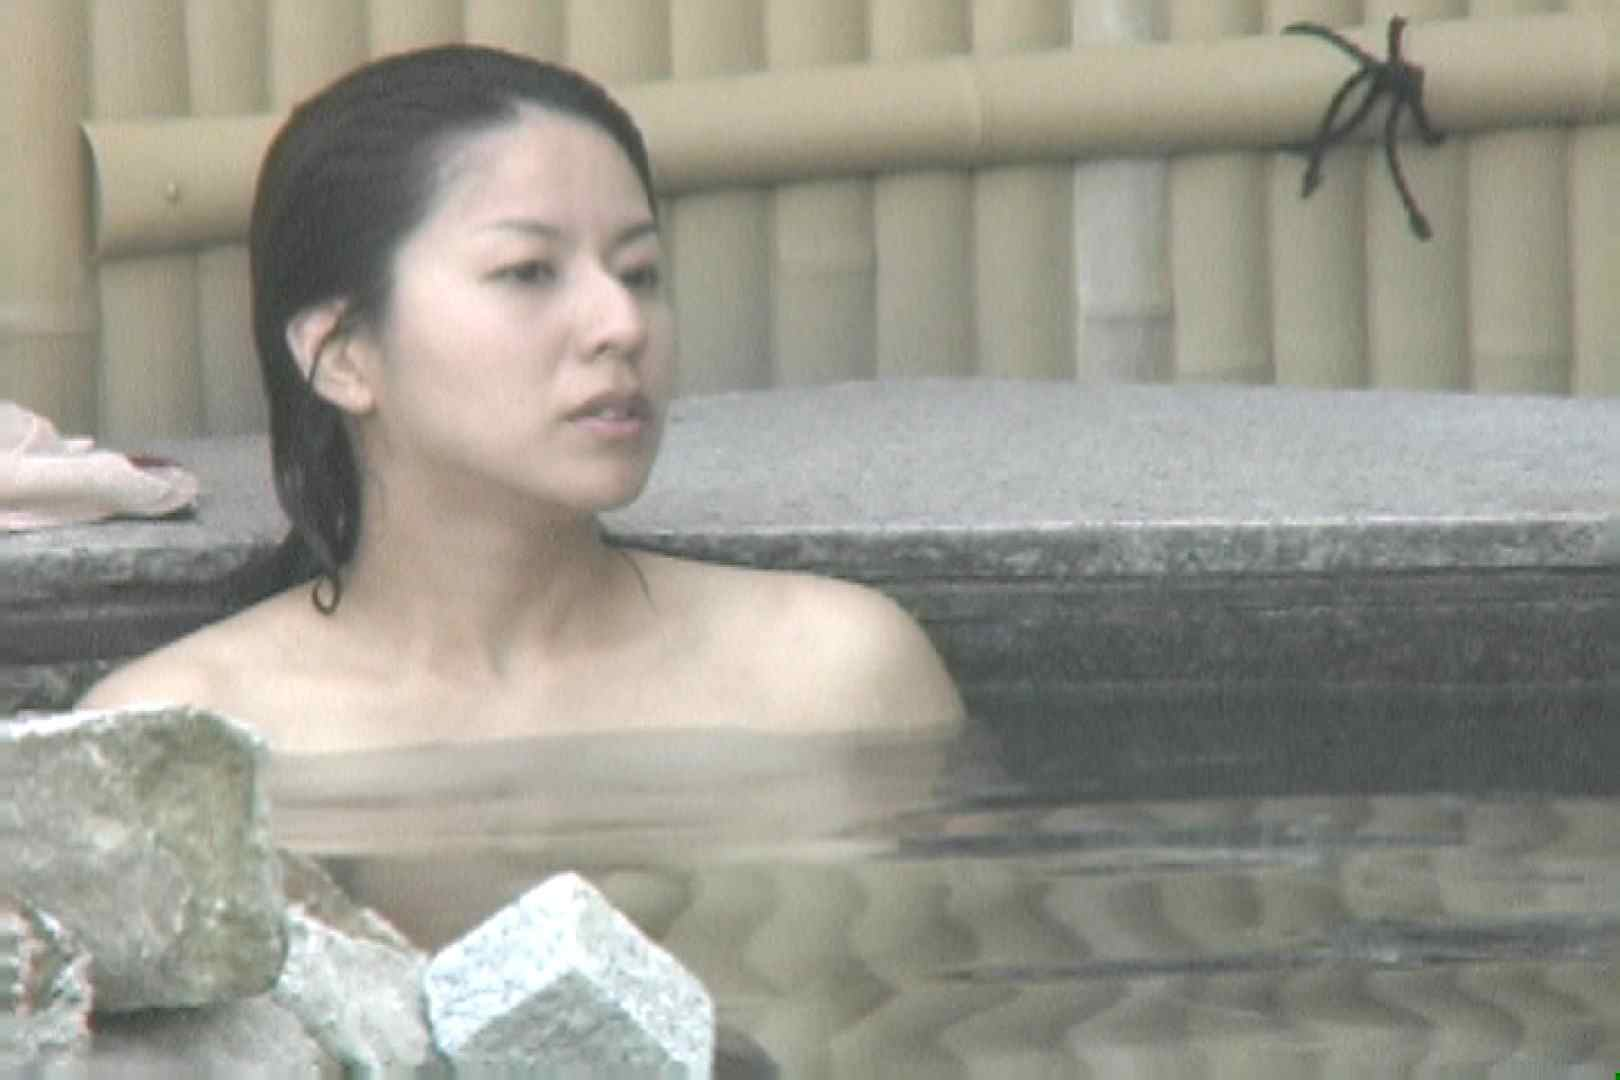 Aquaな露天風呂Vol.694 盗撮 | OLエロ画像  110PICs 28